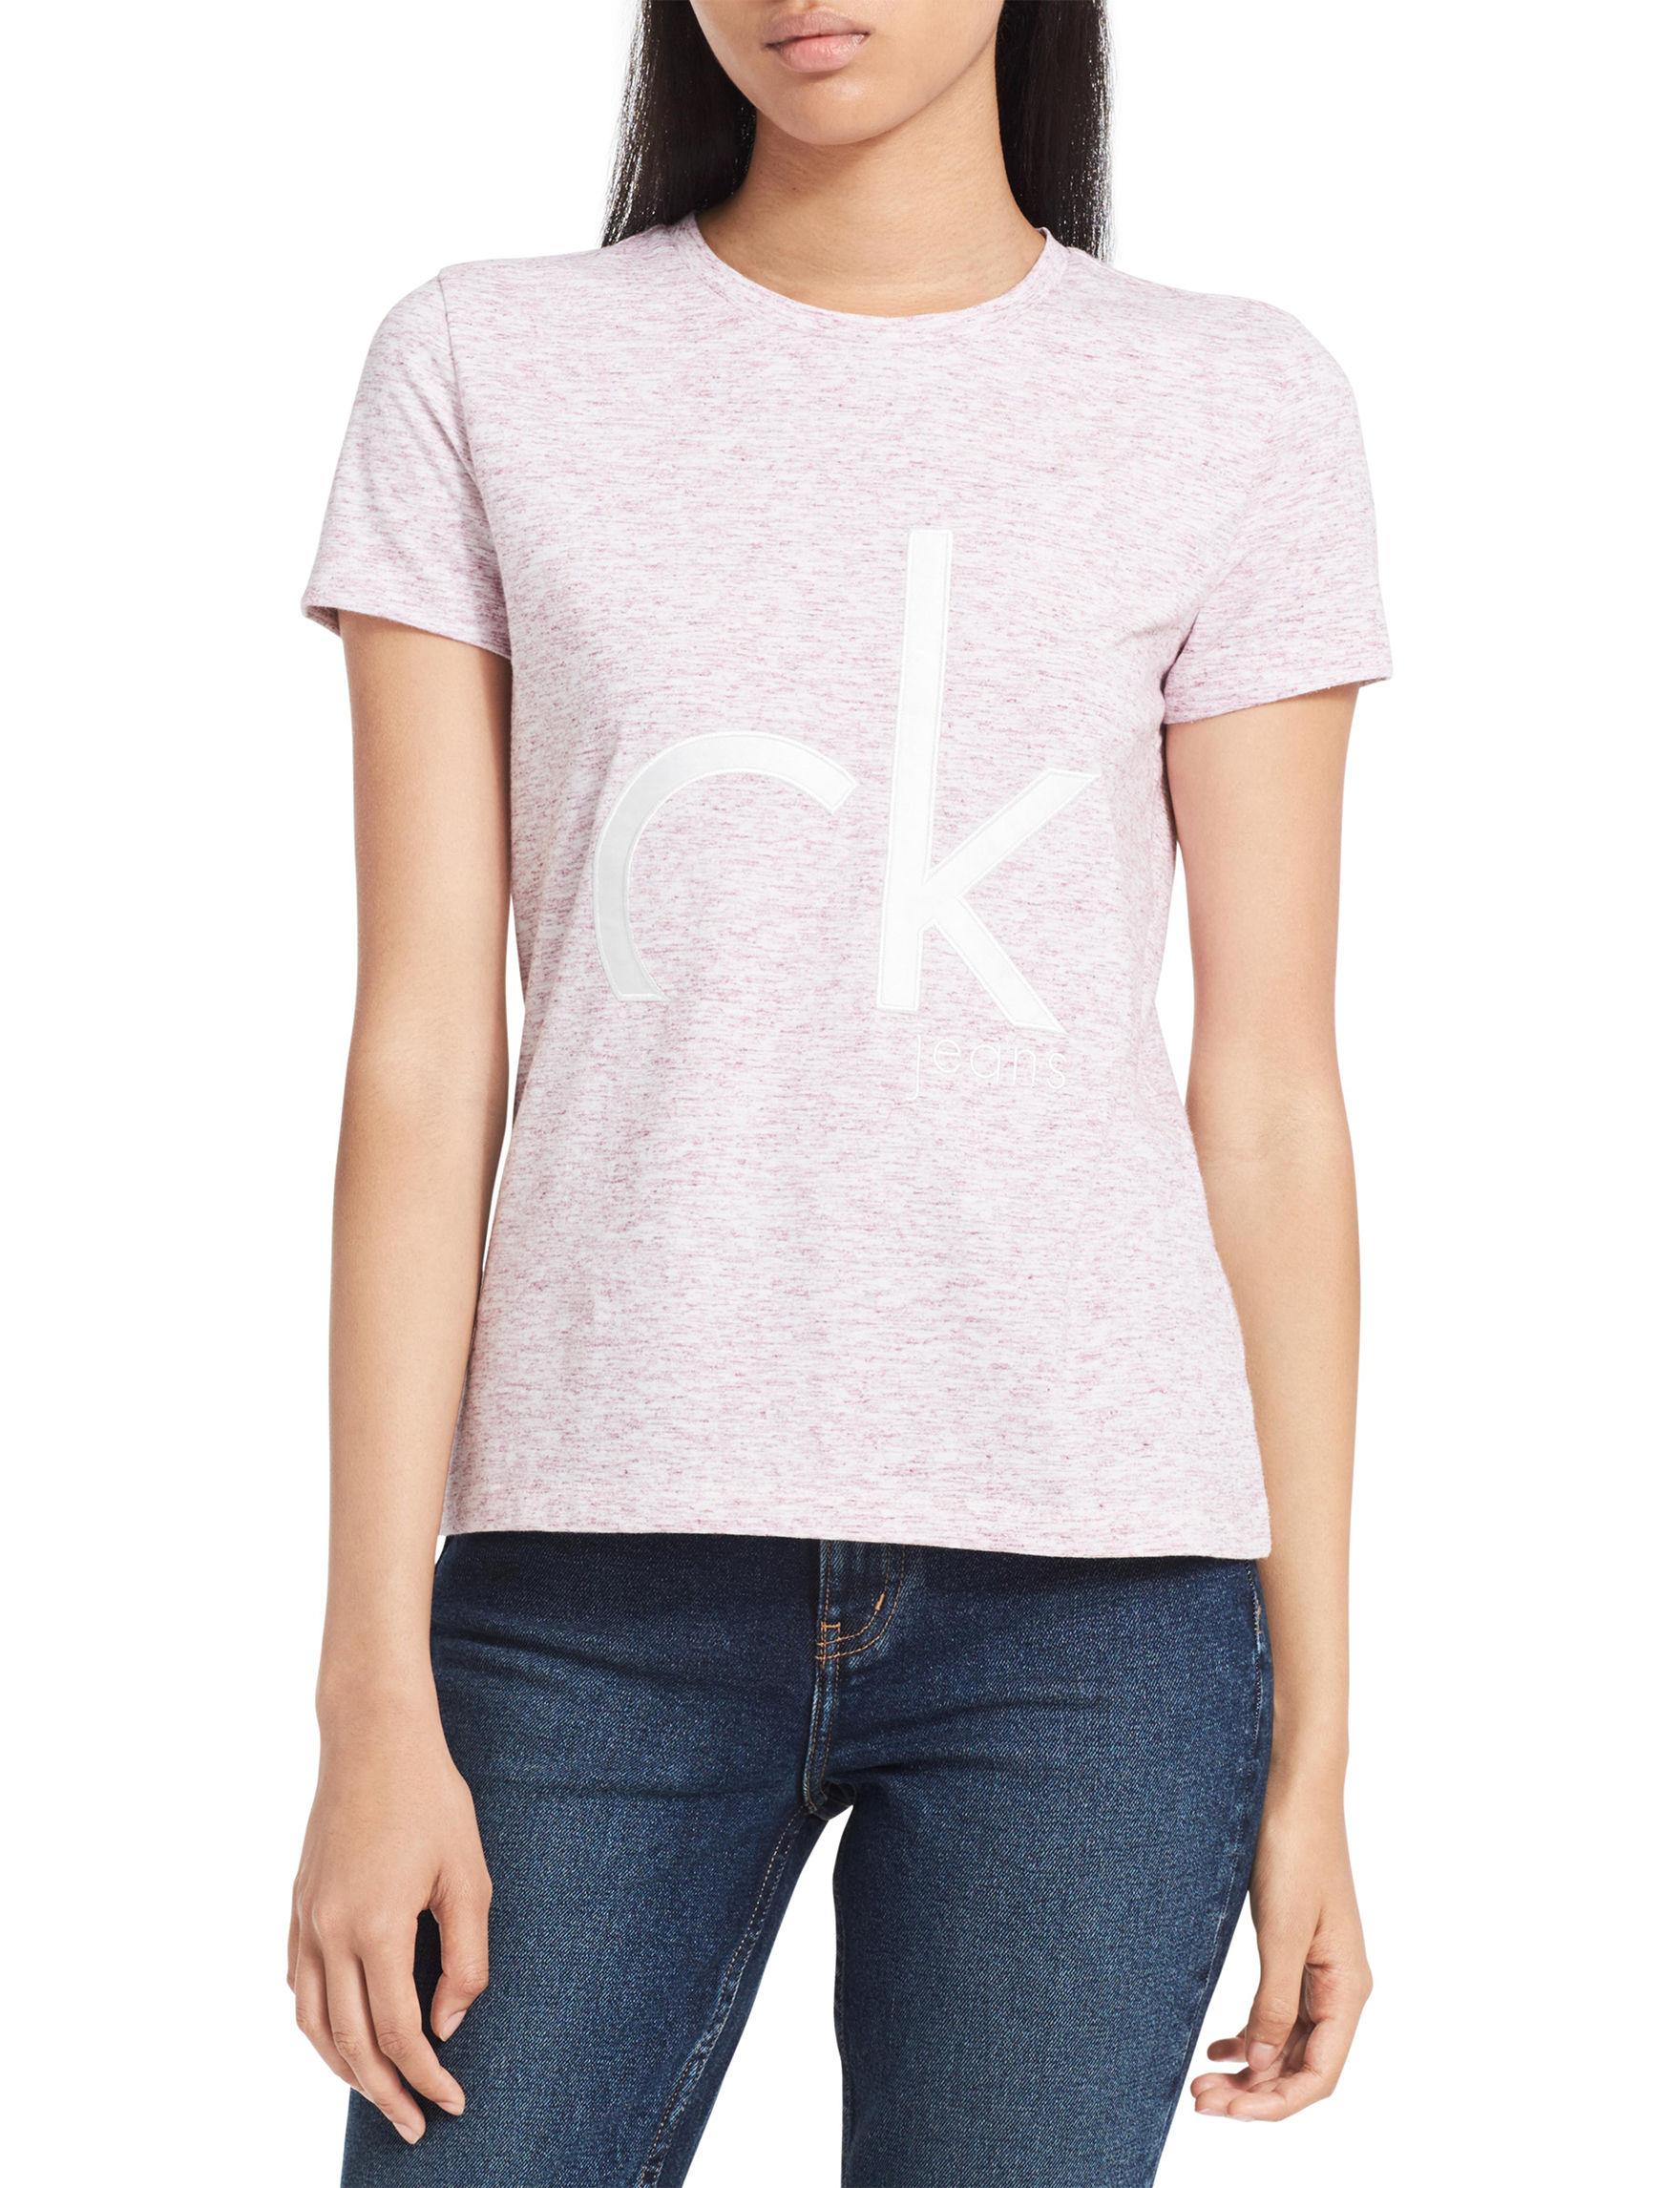 Calvin Klein Jeans Pink Shirts & Blouses Tees & Tanks